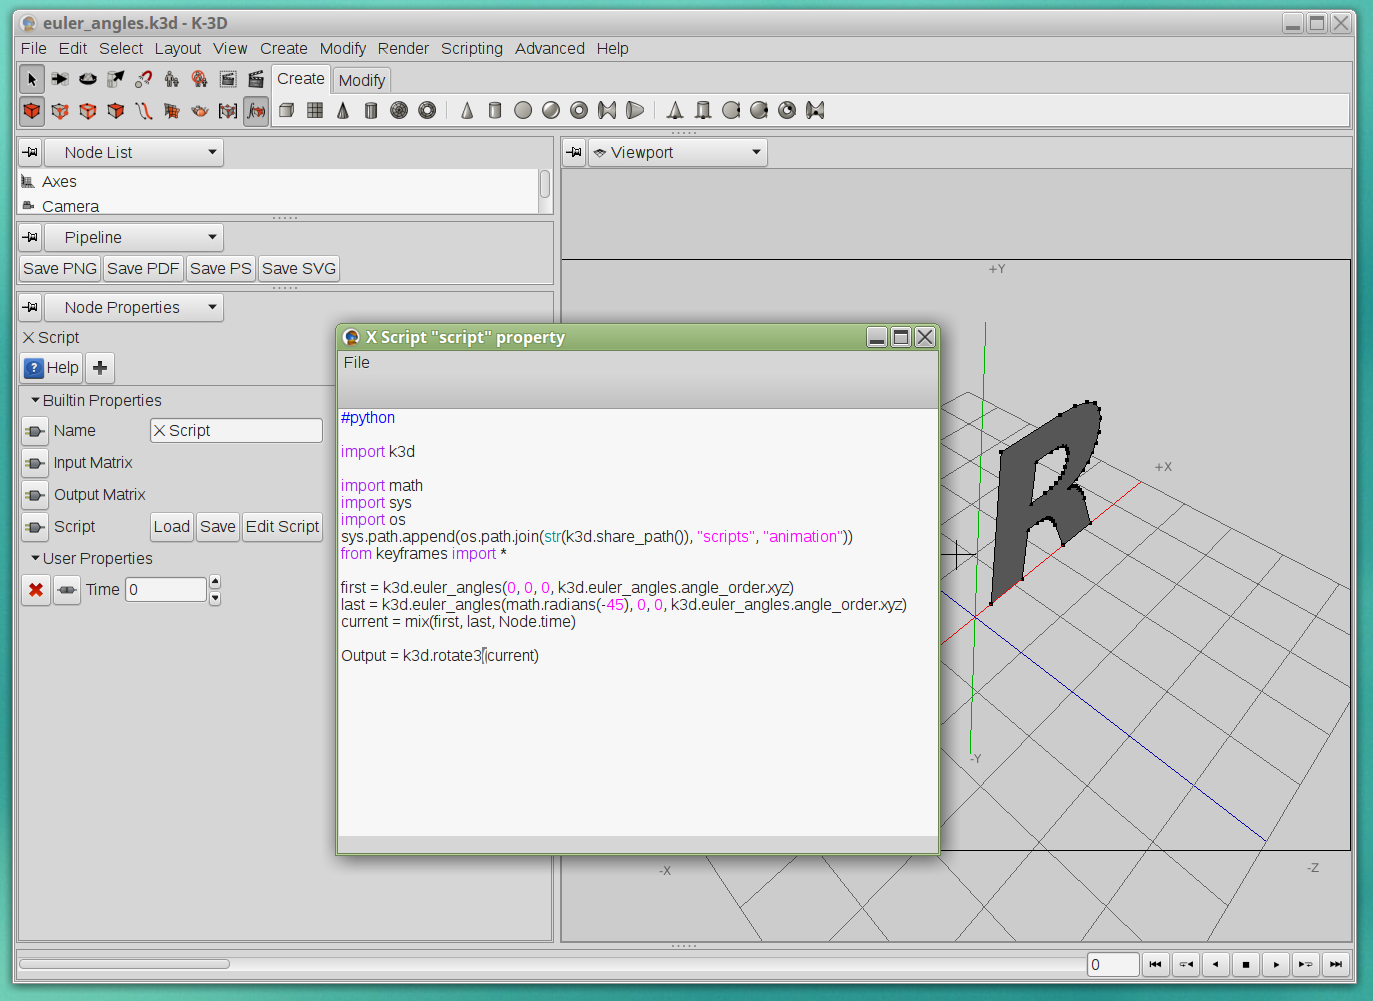 File:K-3D version 0 8 0 3 screenshot, python scripting